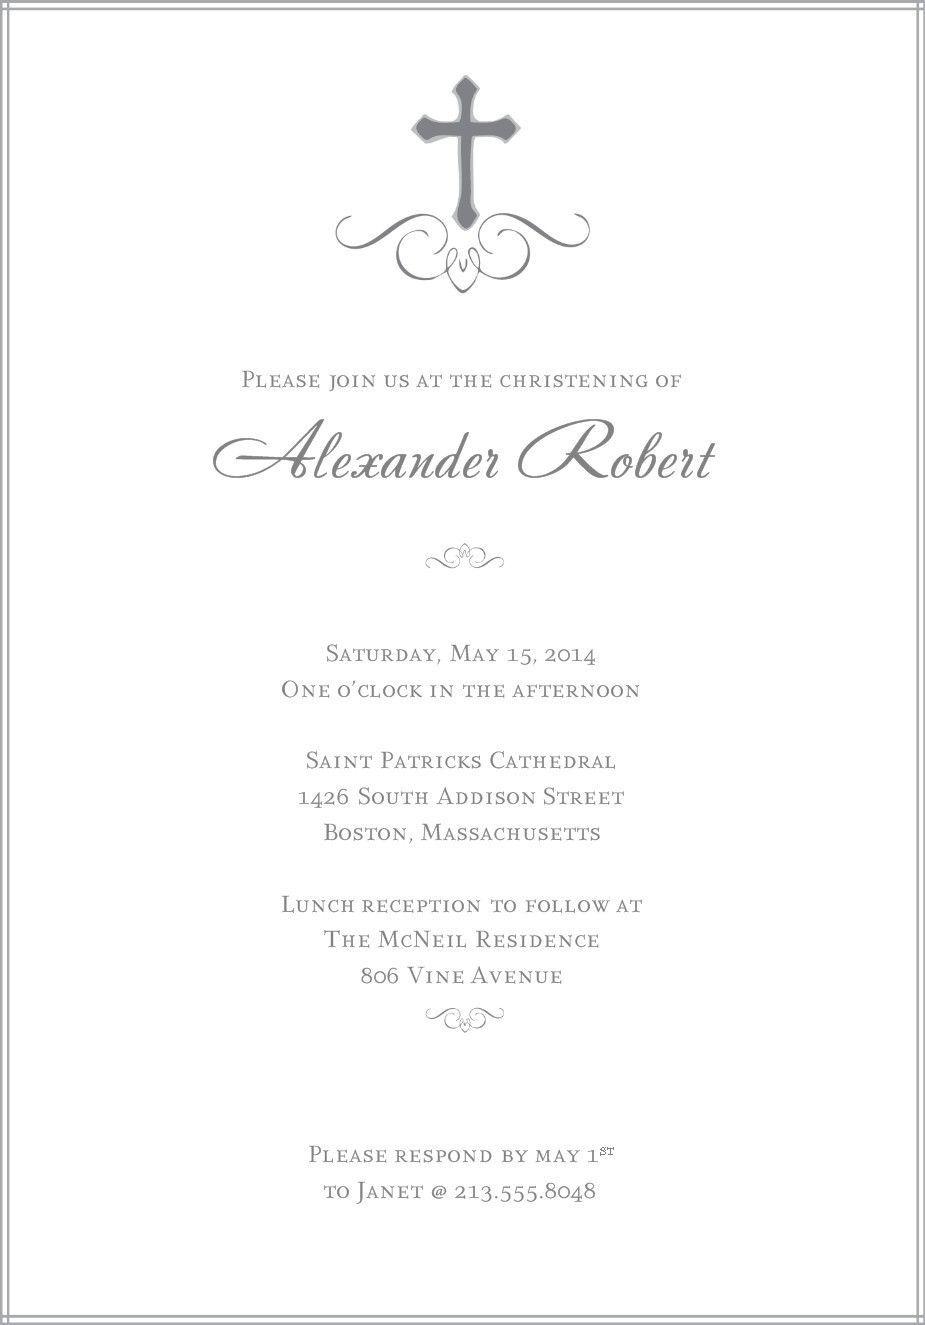 007 Imposing Free Religiou Invitation Template Printable Design Full